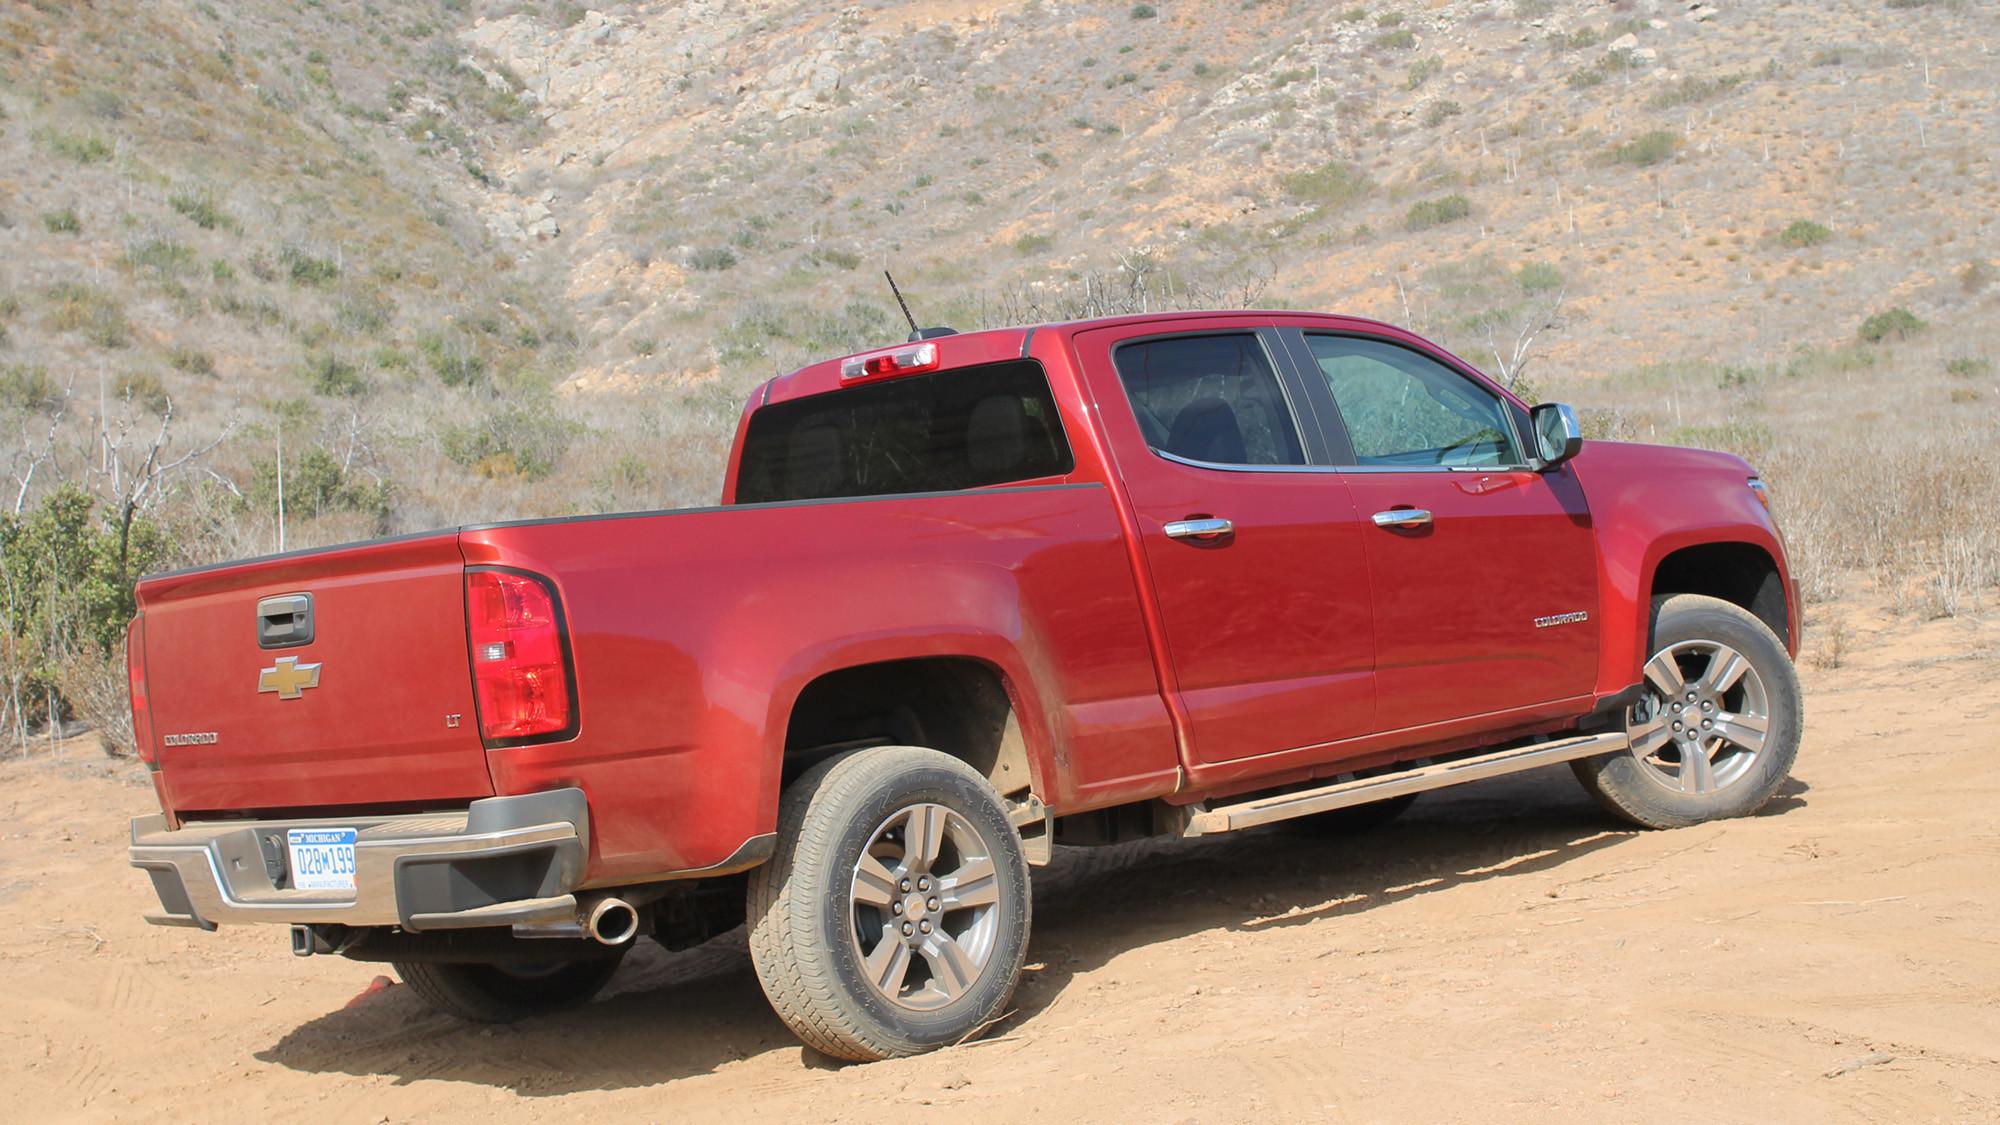 Review all new chevy colorado gmc canyon add vigor to mid size truck segment la times